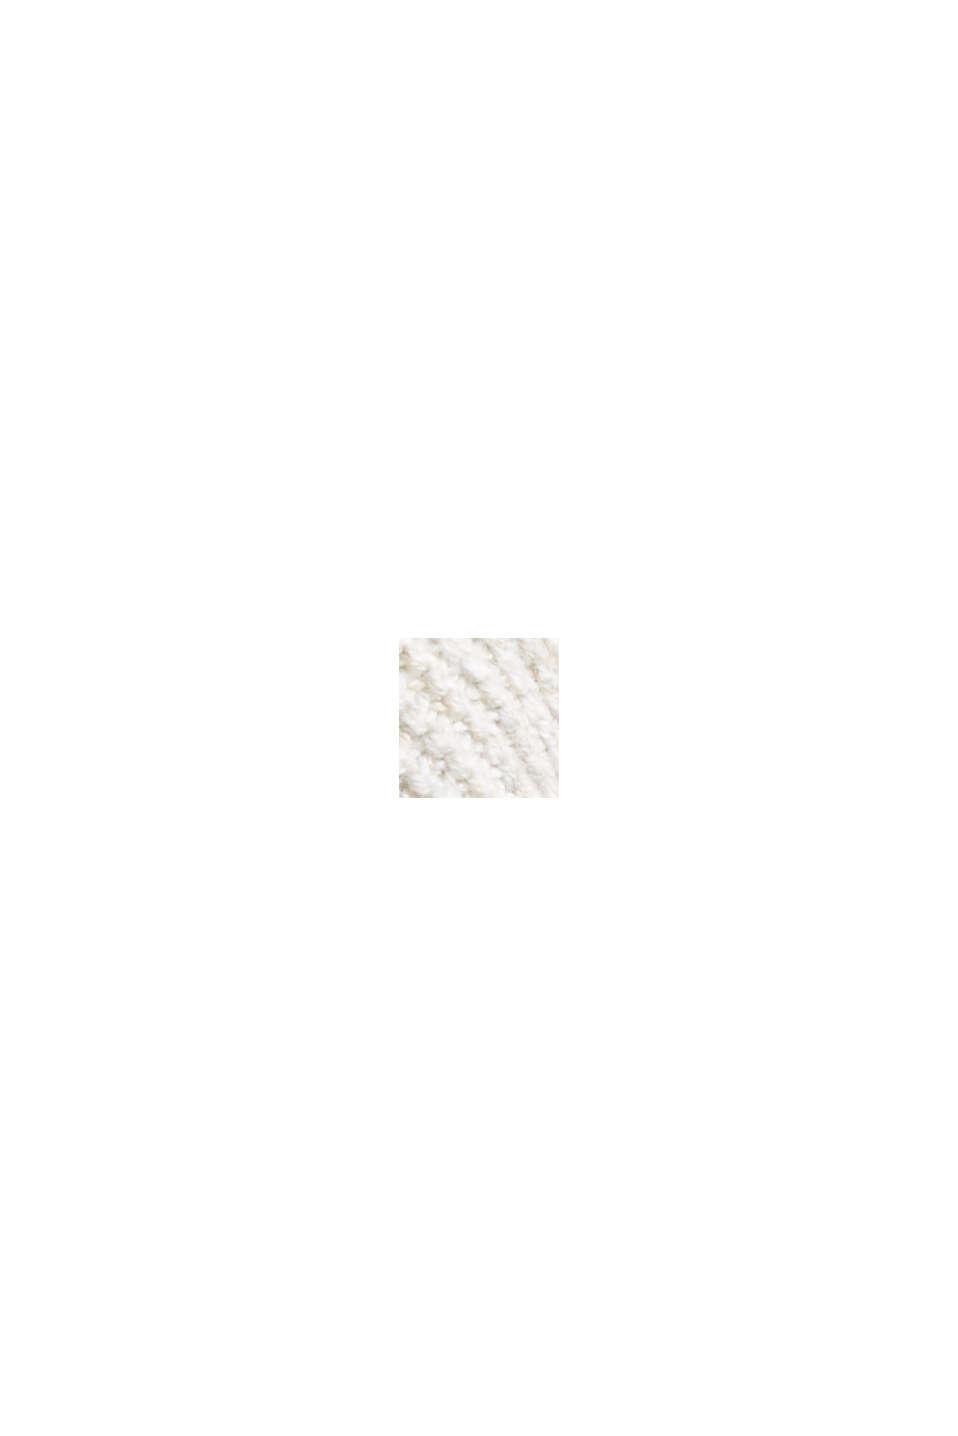 Pull-over texturé, 100% coton biologique, LIGHT TAUPE, swatch